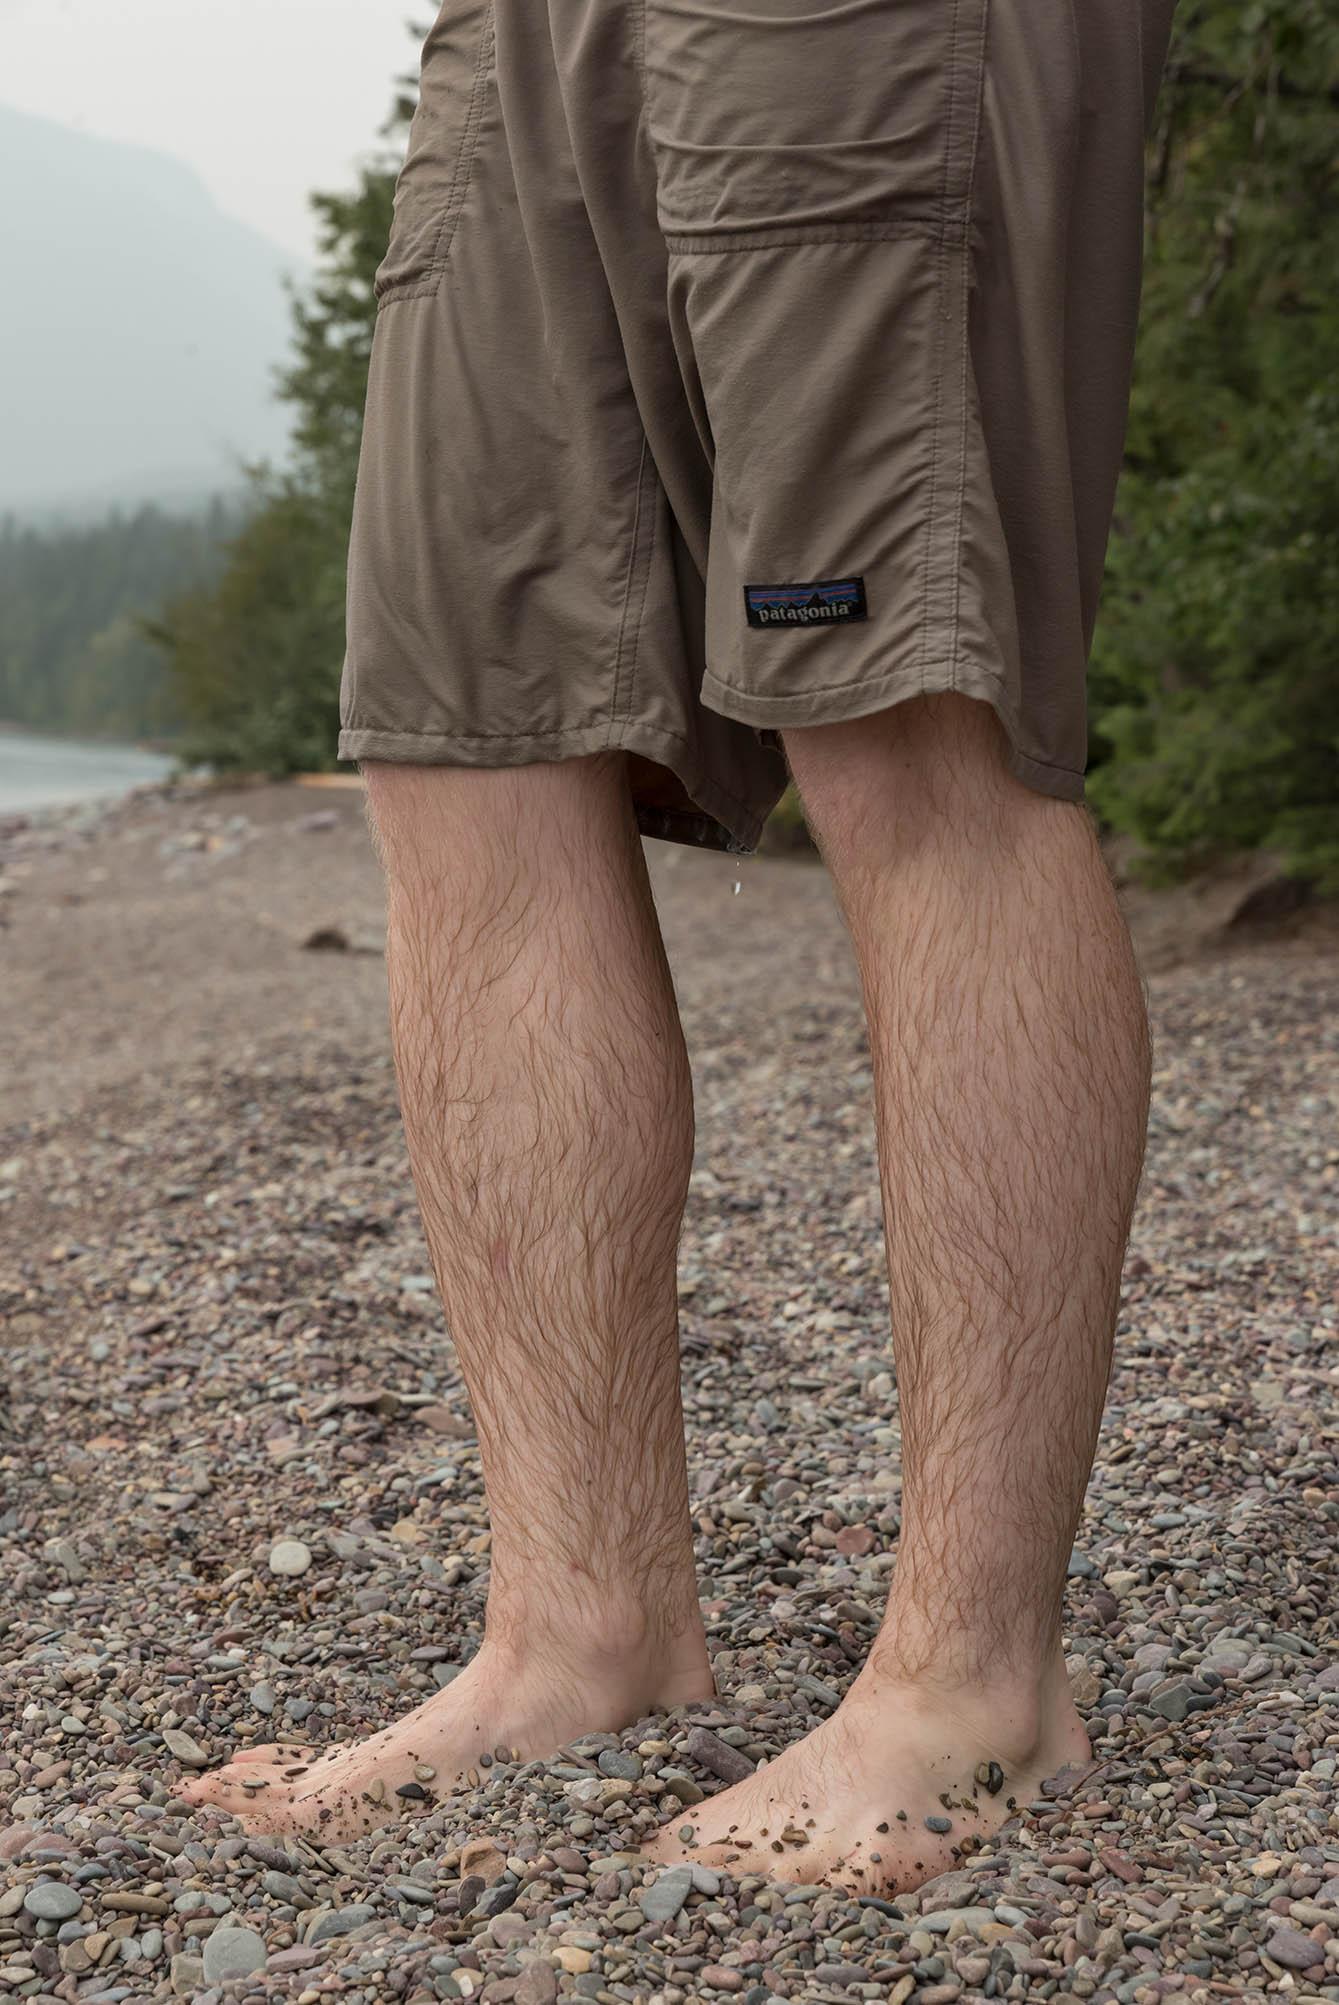 collins_legs_at_lake_mcdonald.jpg